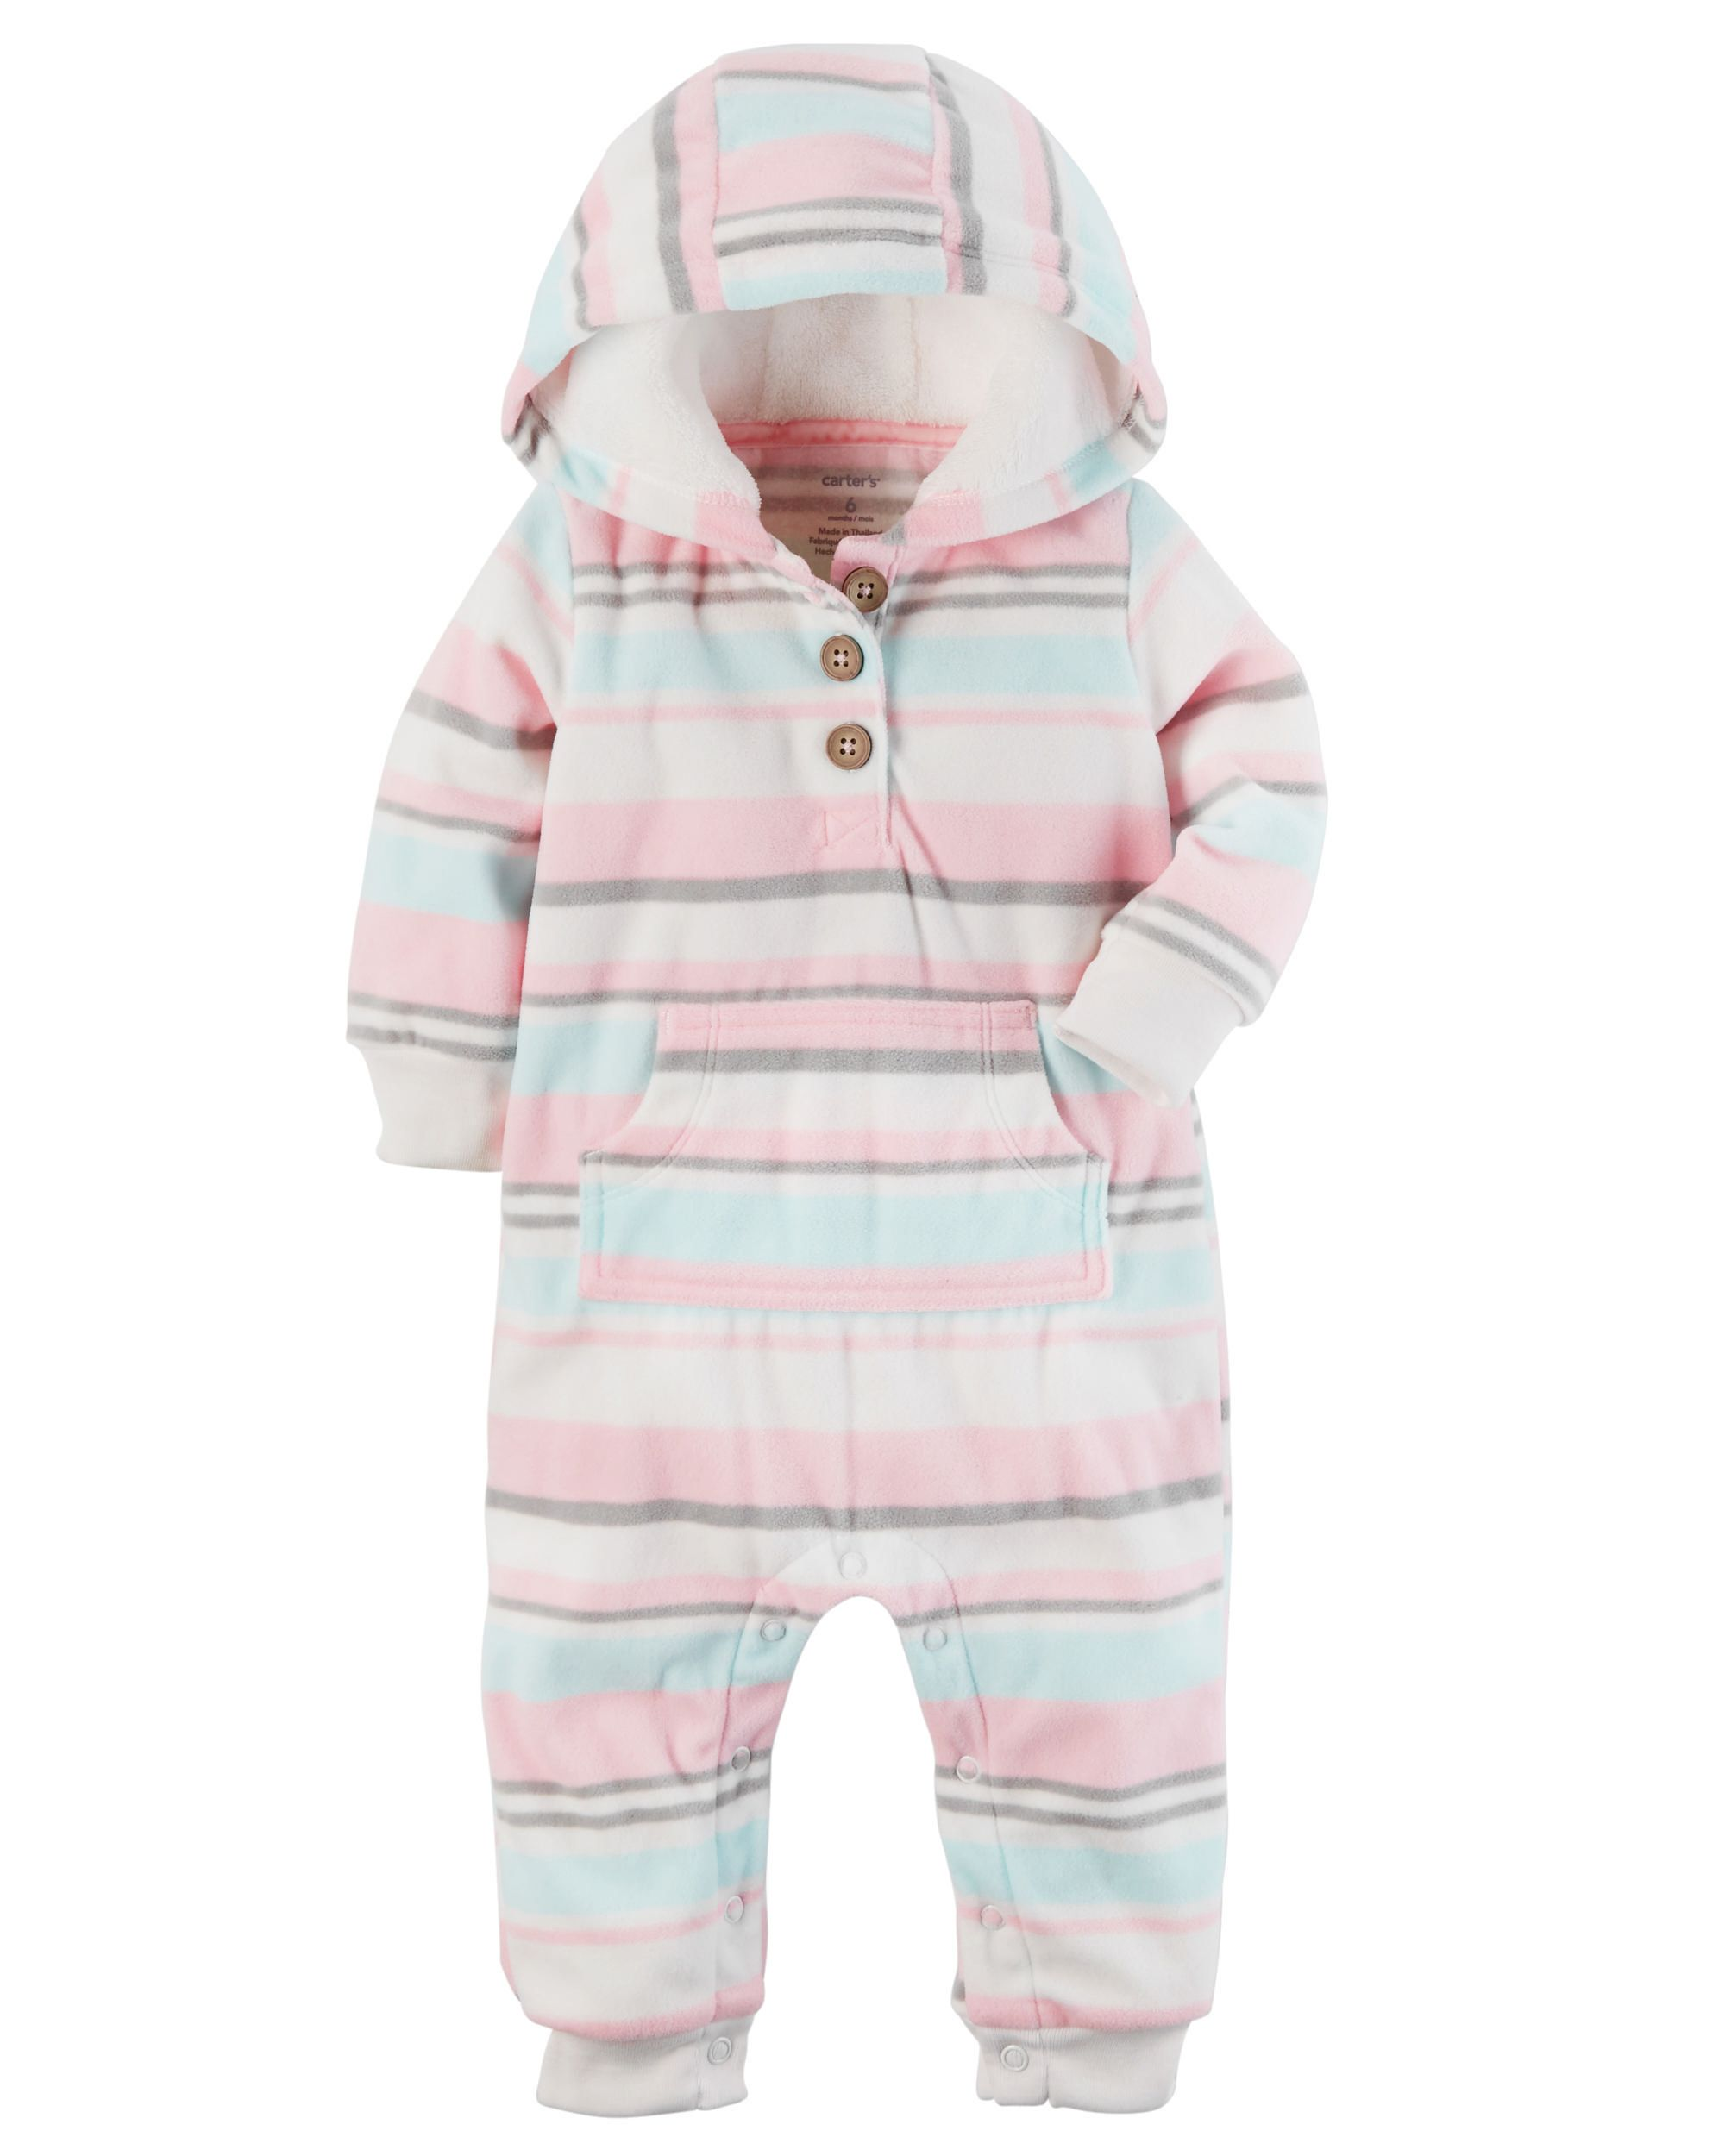 Jimonda Baby Footie 2-Pack Pajamas Cotton Sleeper Printed Romper for Sleep and Play